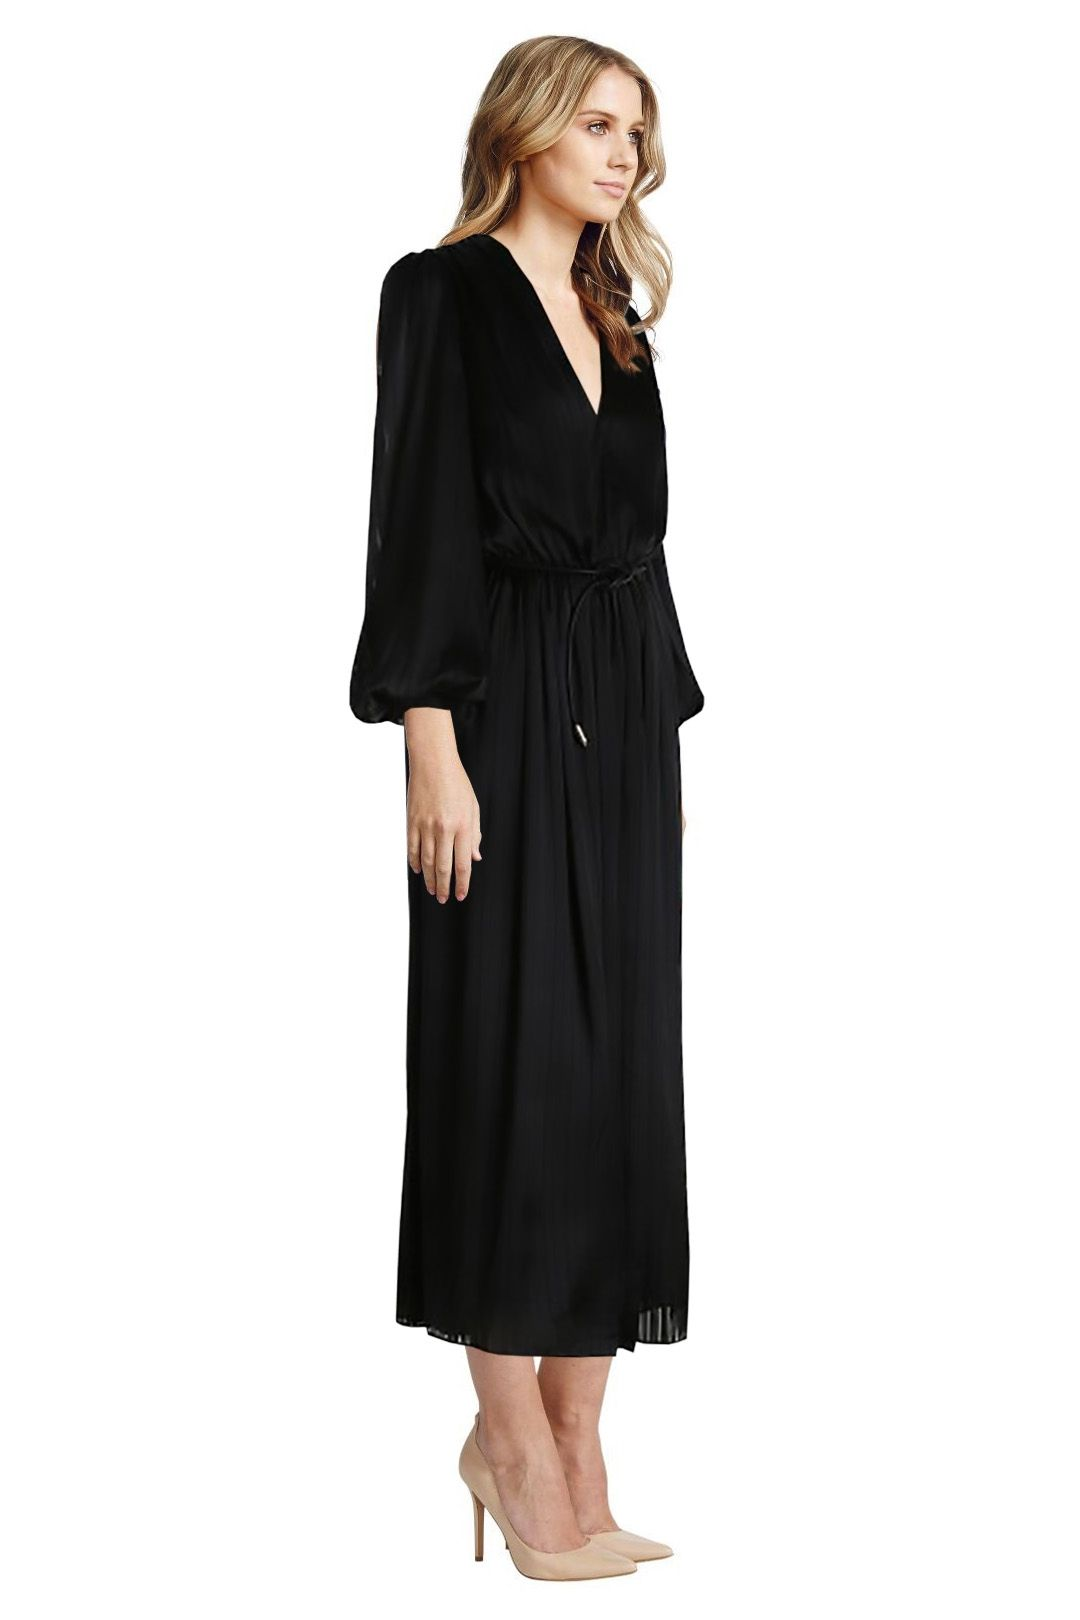 Zimmermann - Arcadia Stripe Slouch Dress - Black - Side